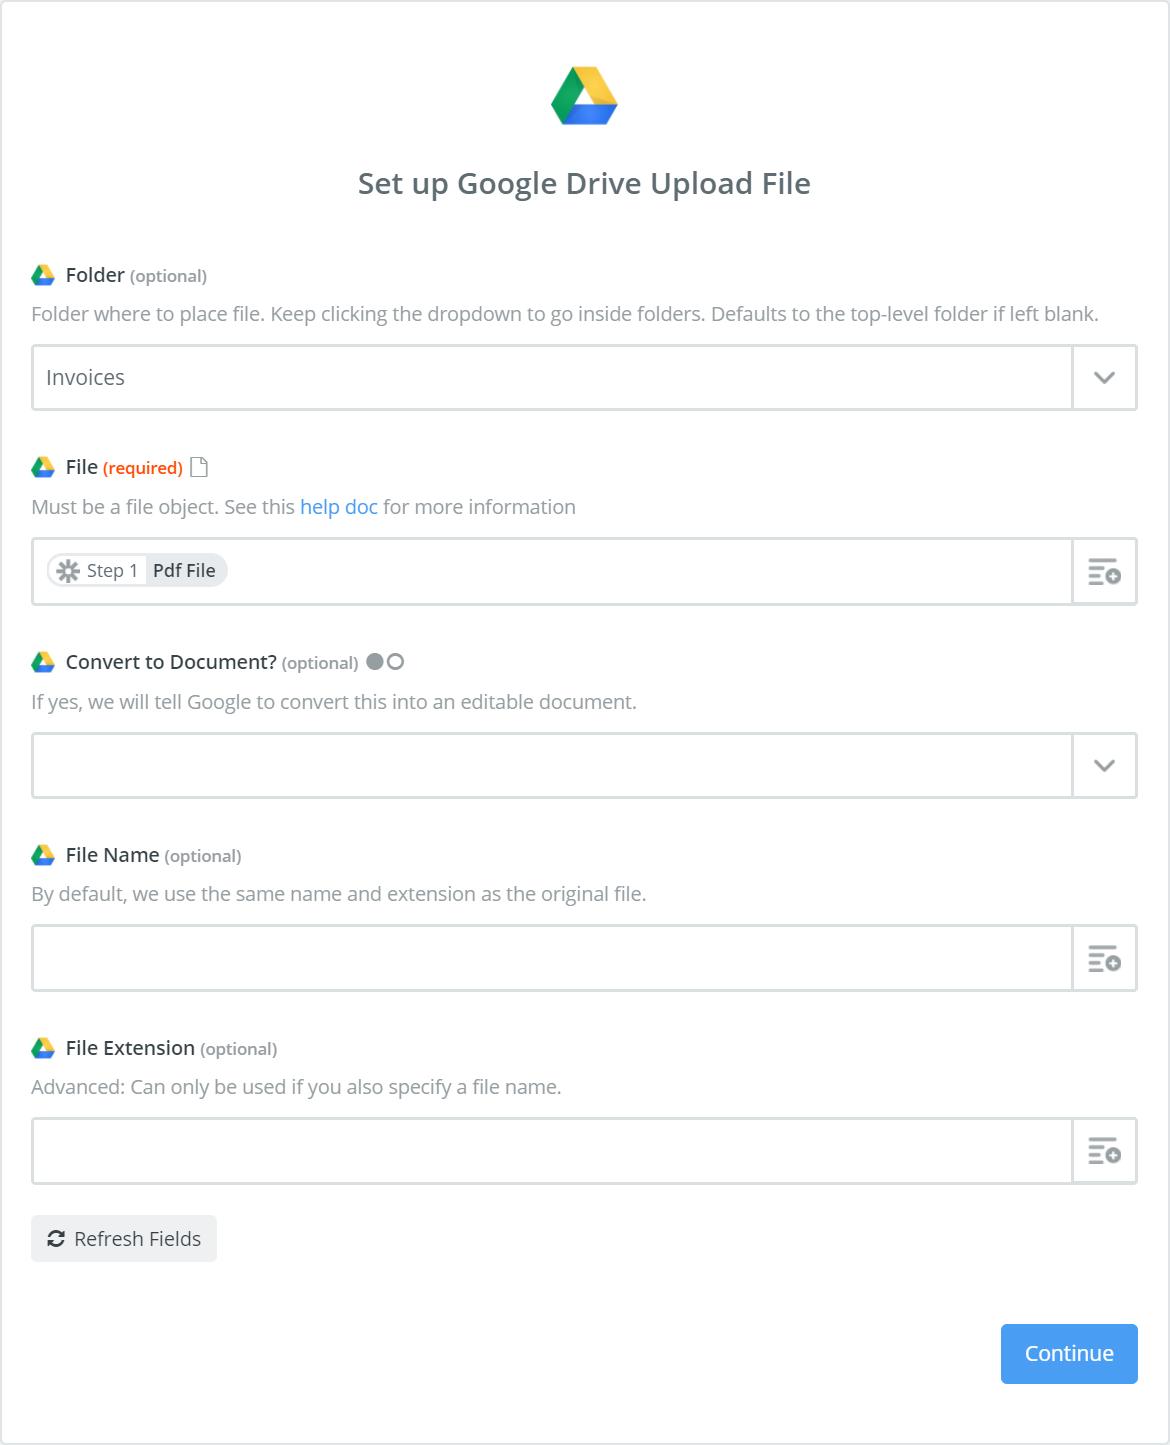 Google Drive Set up